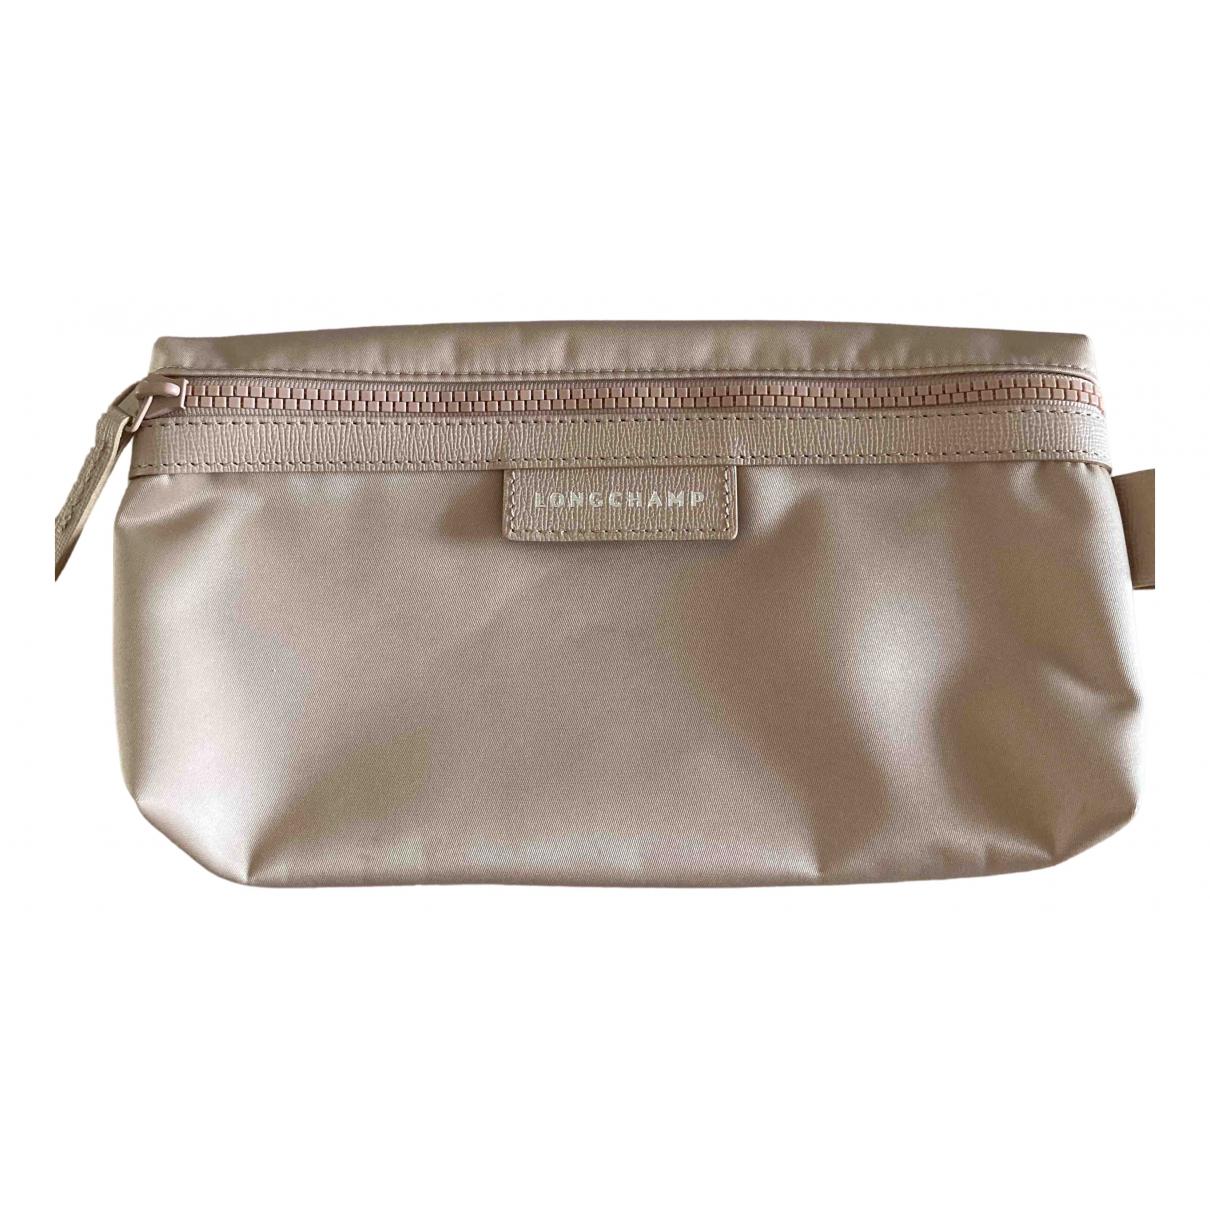 Longchamp N Beige Cloth Purses, wallet & cases for Women N